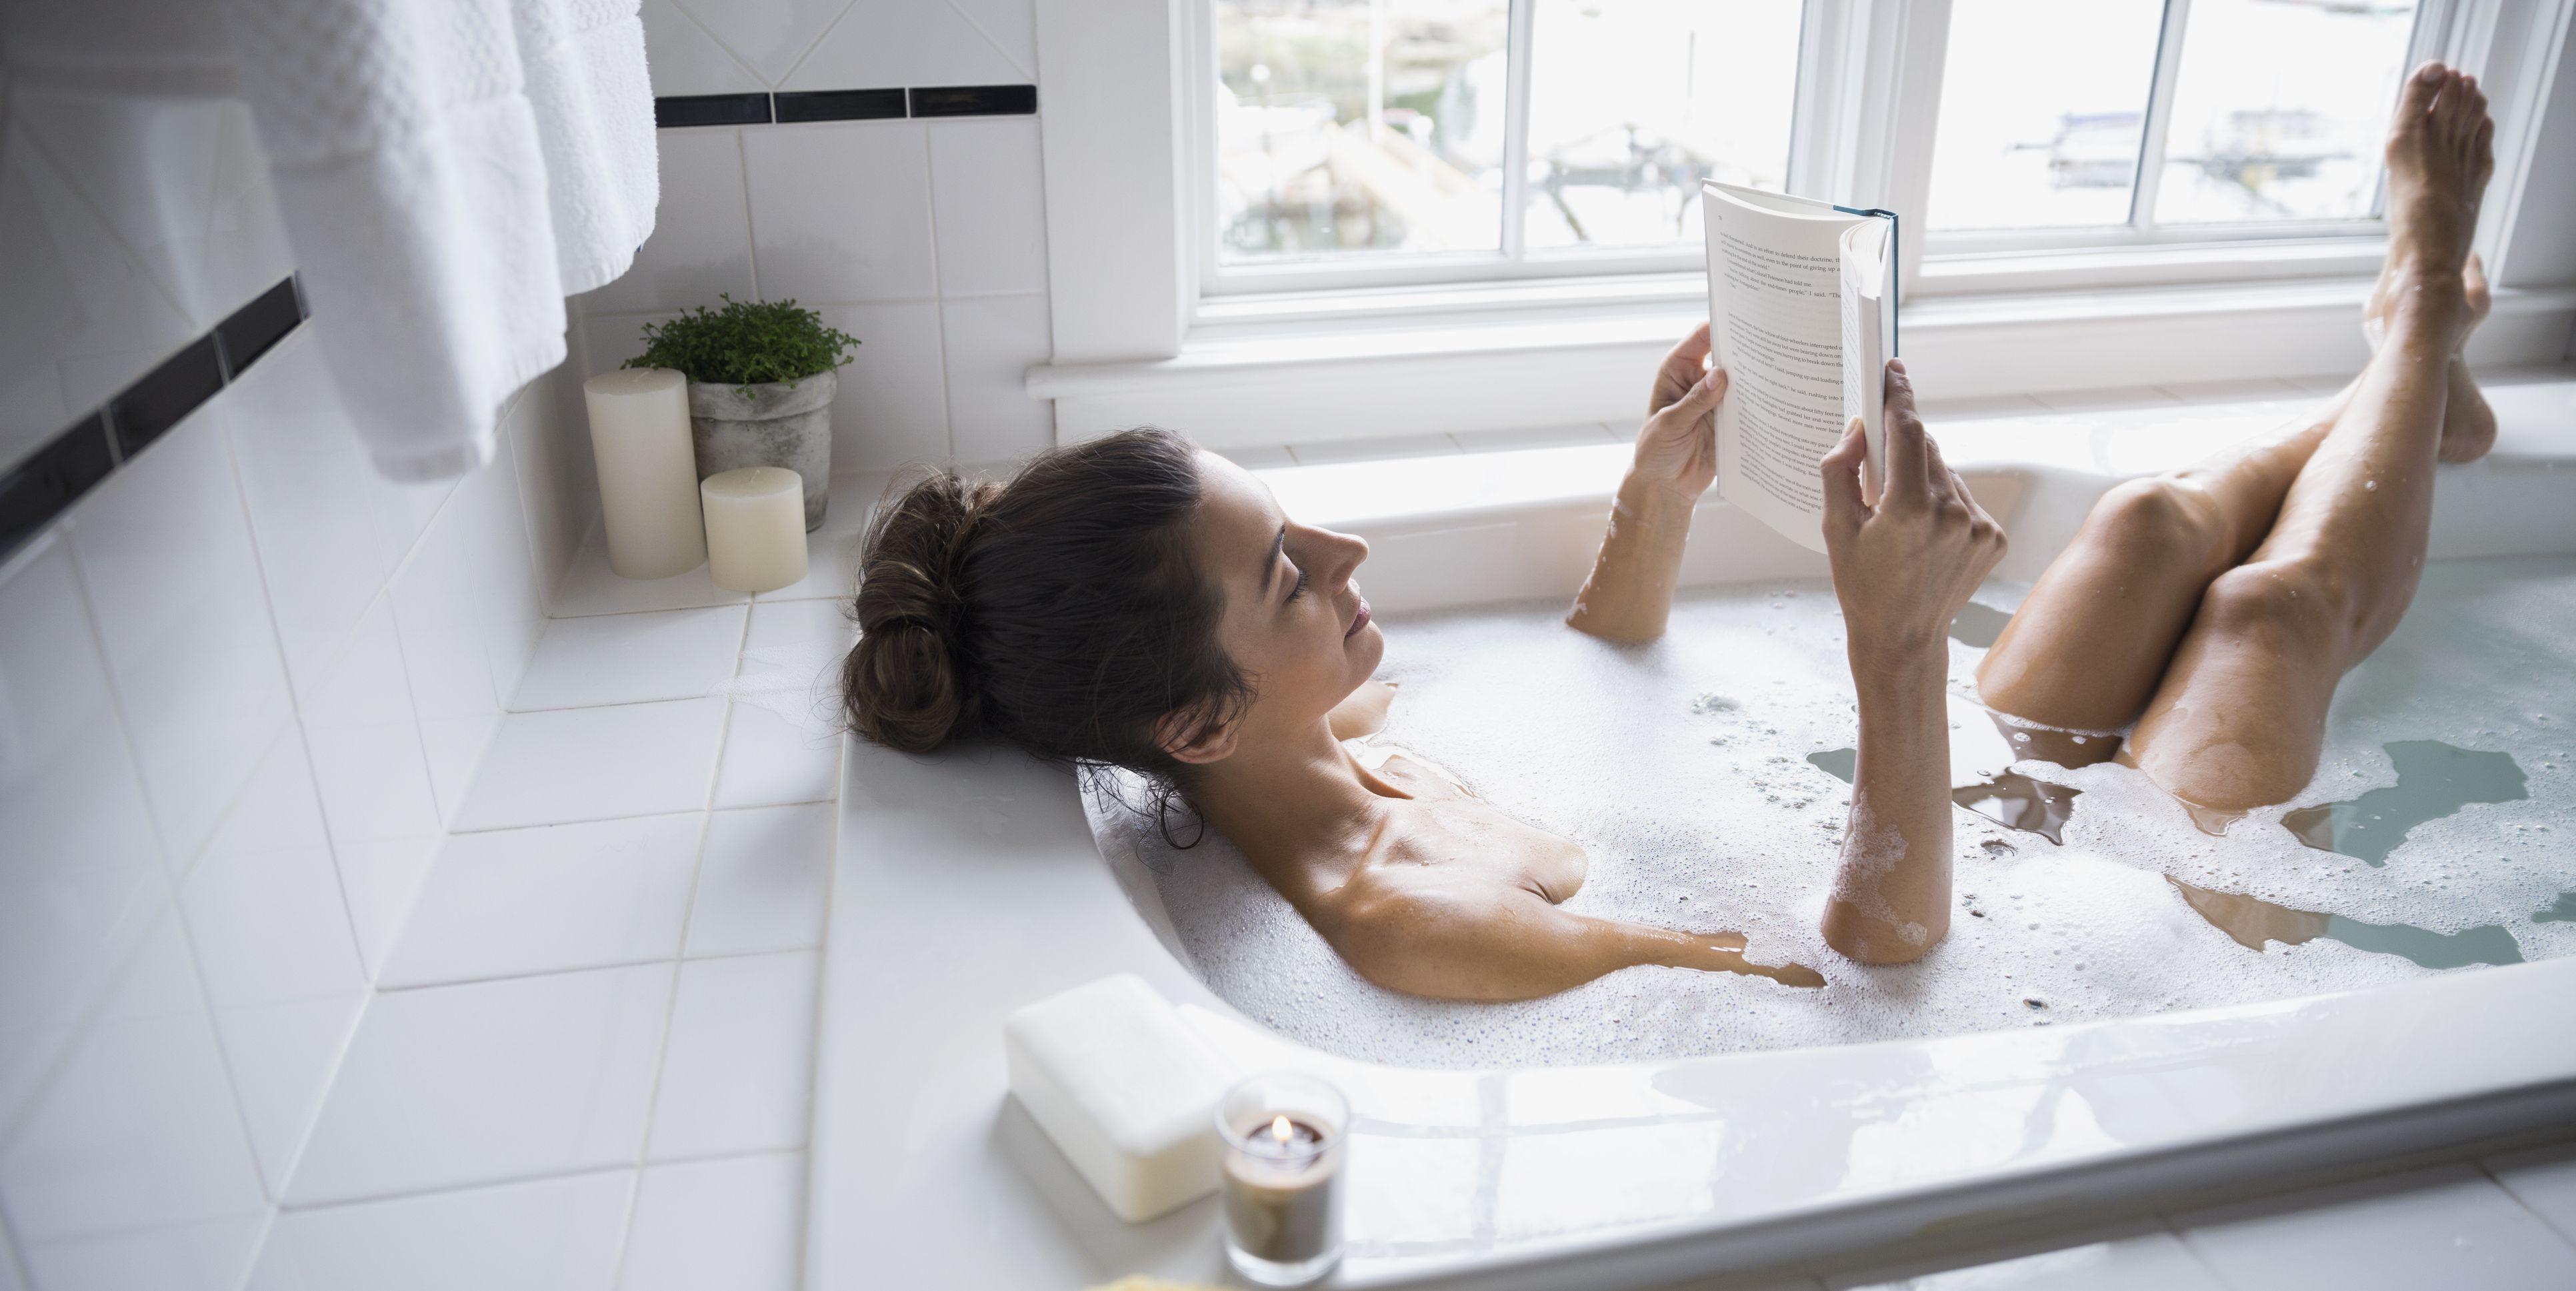 Woman reading book in bubble bath